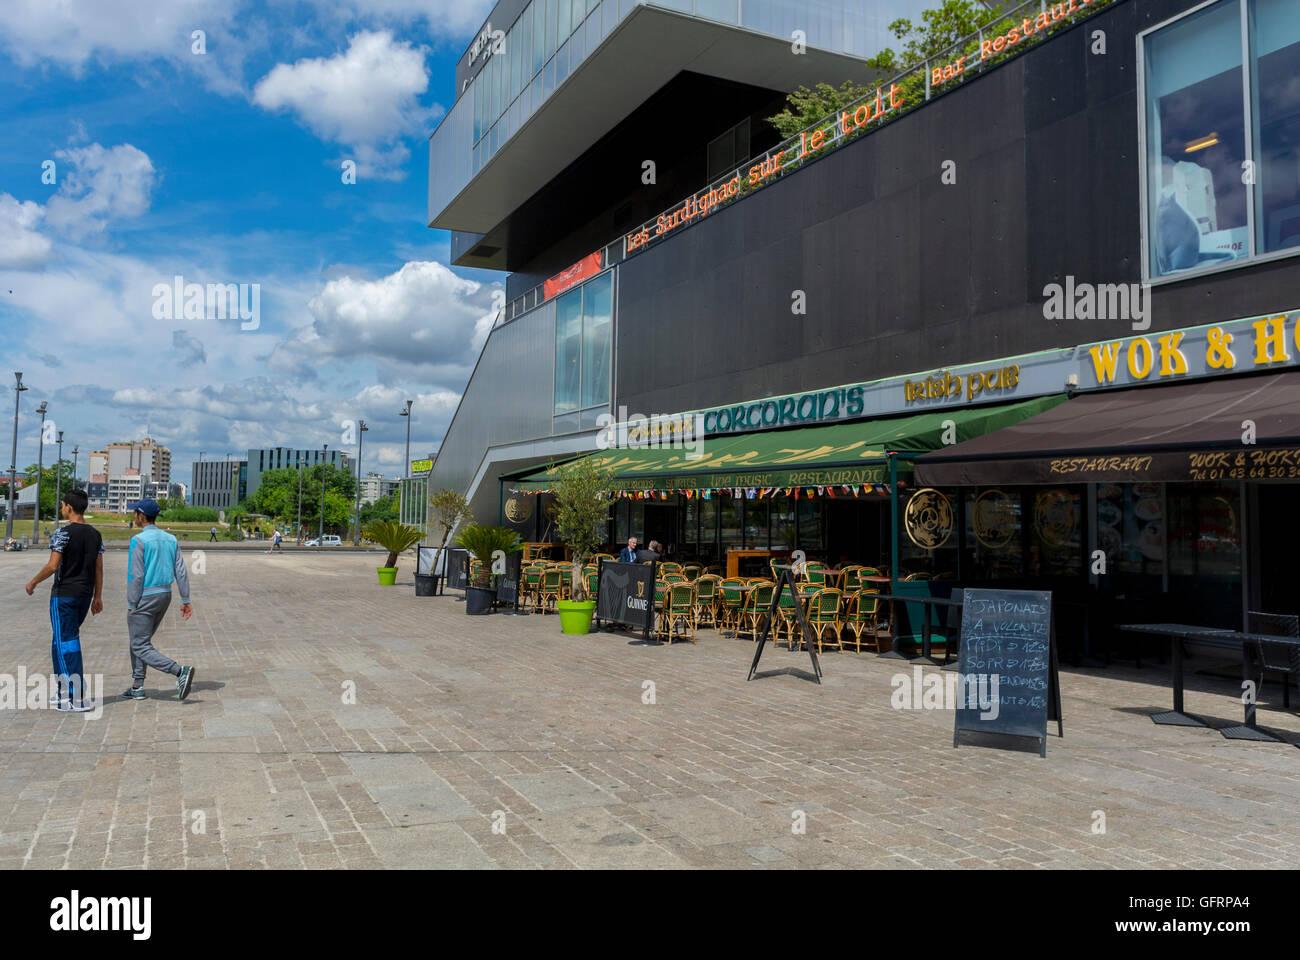 París, Francia, Suburbios, escenas de calle, Arquitectura moderna, Restaurante Francés, Porte des Lilas, Sena Saint Denis, barrio suburbano Foto de stock